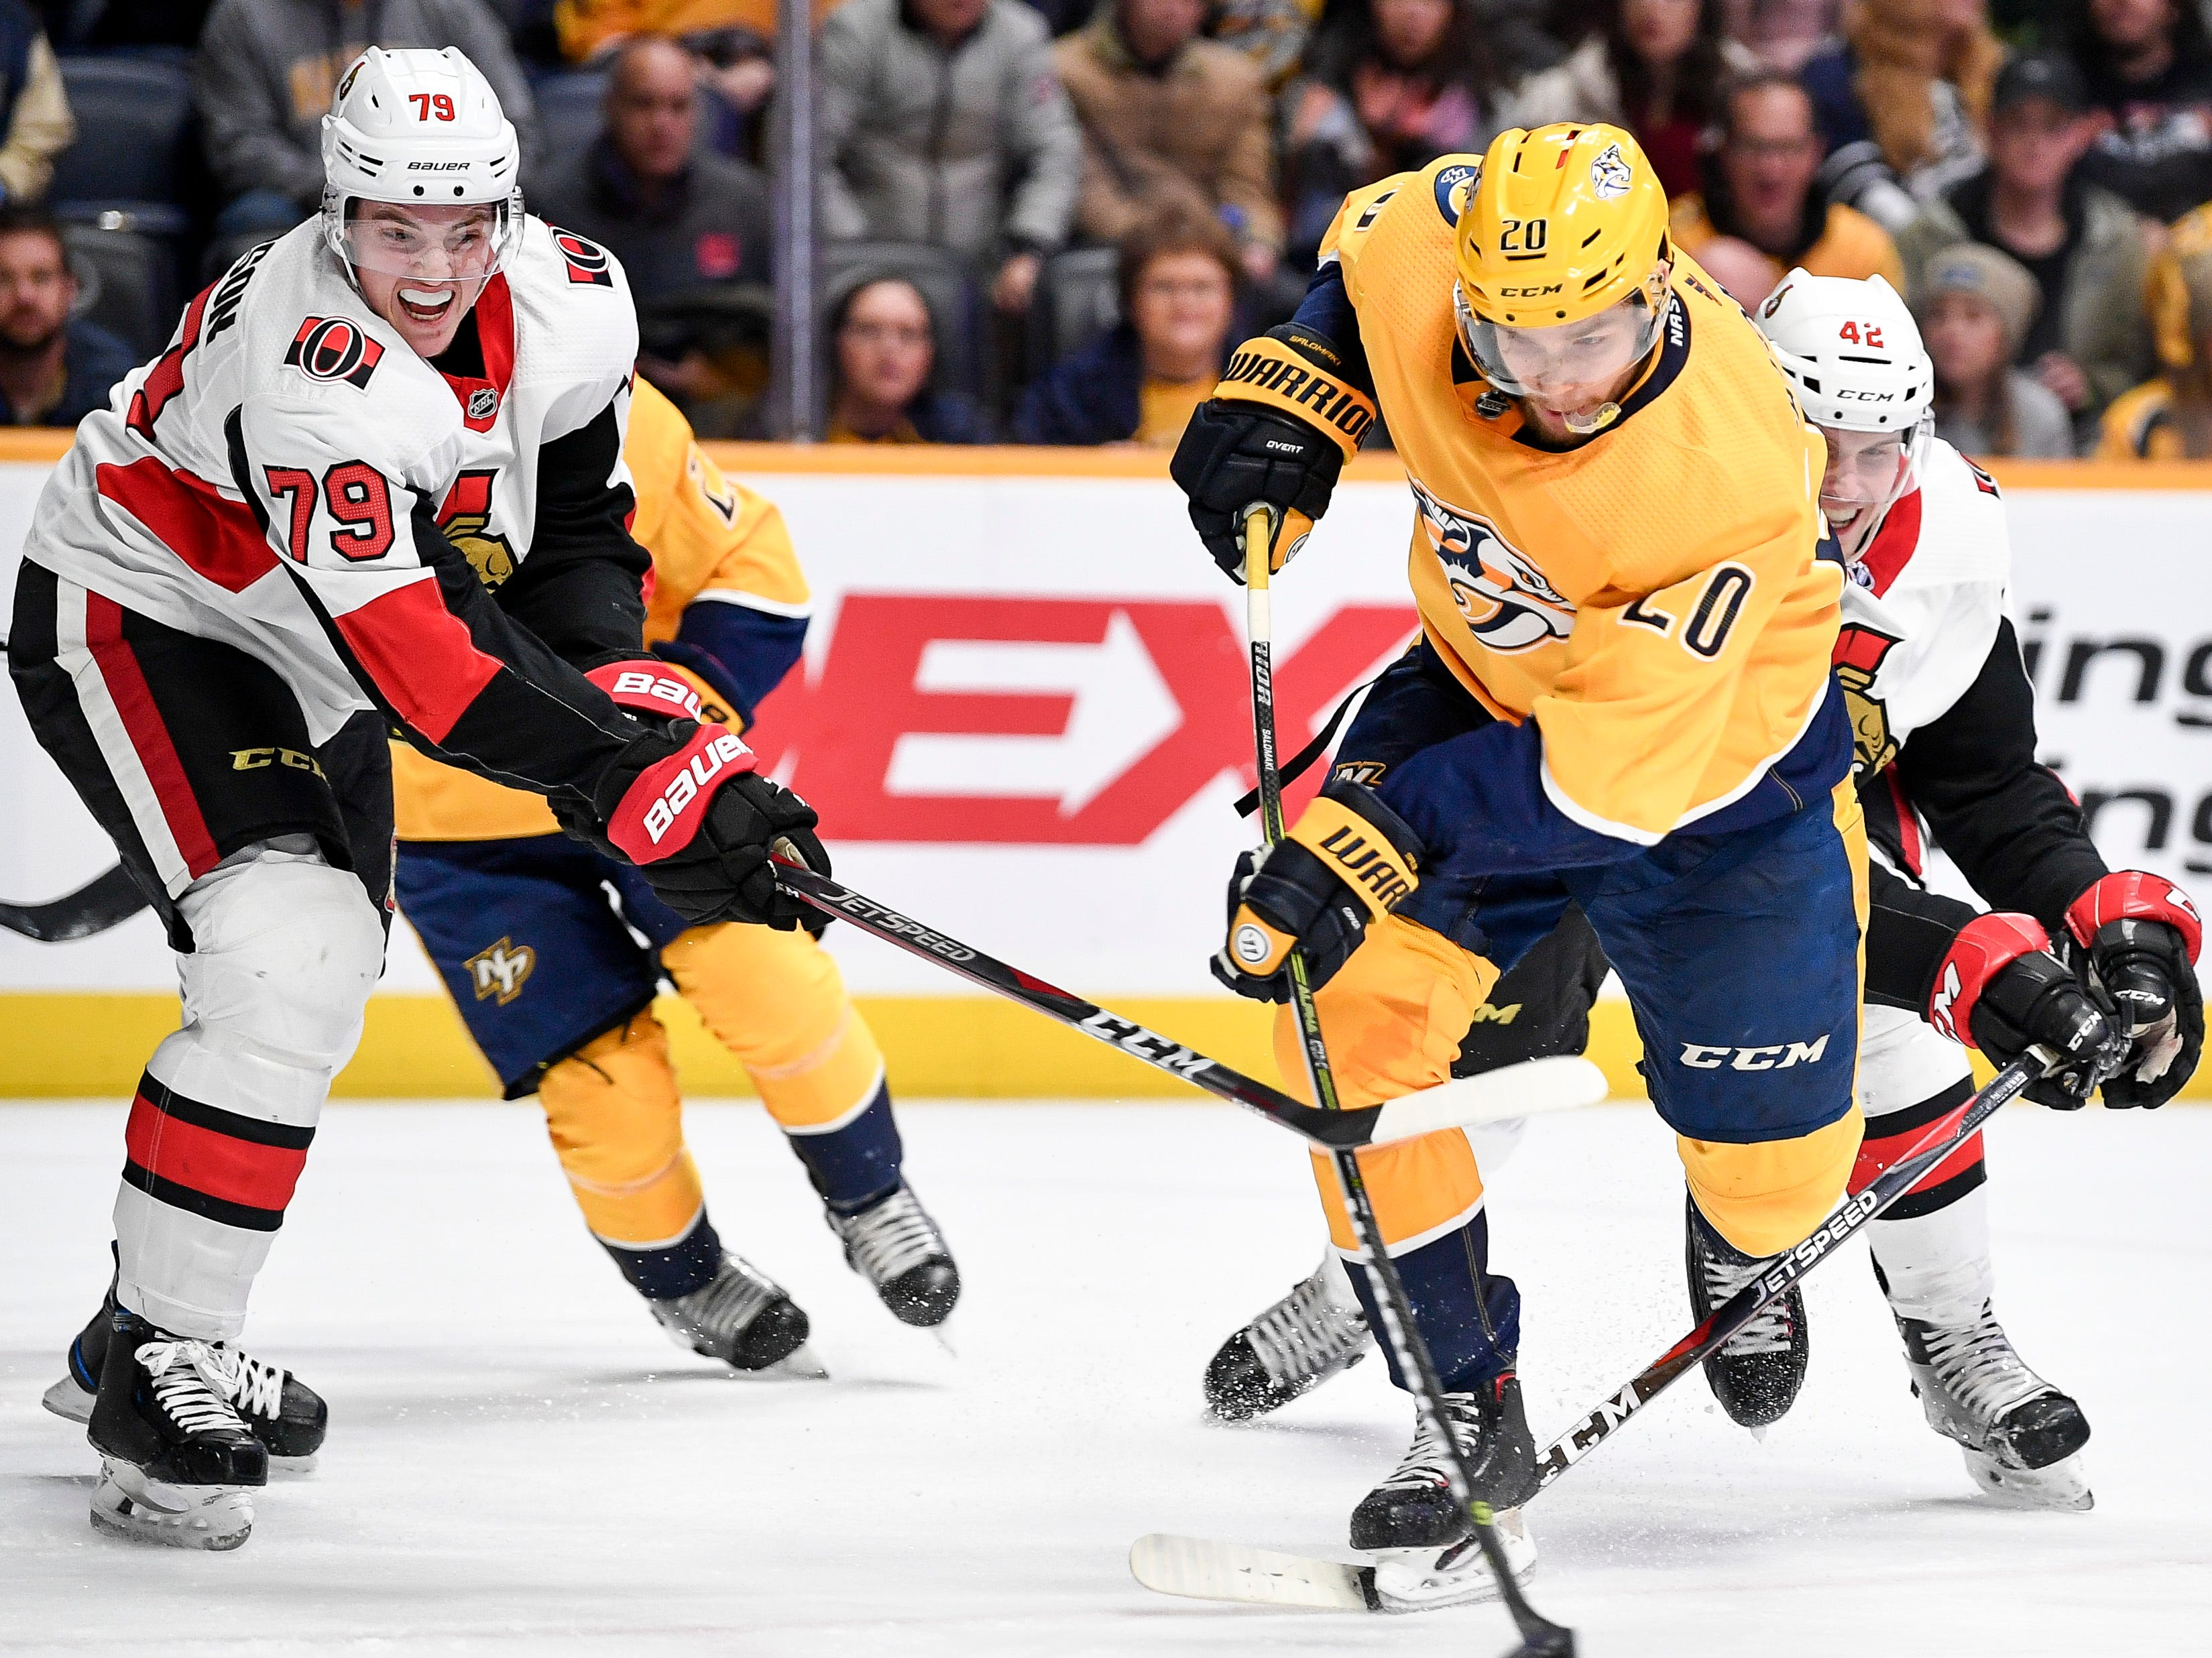 Nashville Predators right wing Miikka Salomaki (20) shoots past Ottawa Senators right wing Drake Batherson (79) during the first period at Bridgestone Arena in Nashville, Tenn., Tuesday, Dec. 11, 2018.